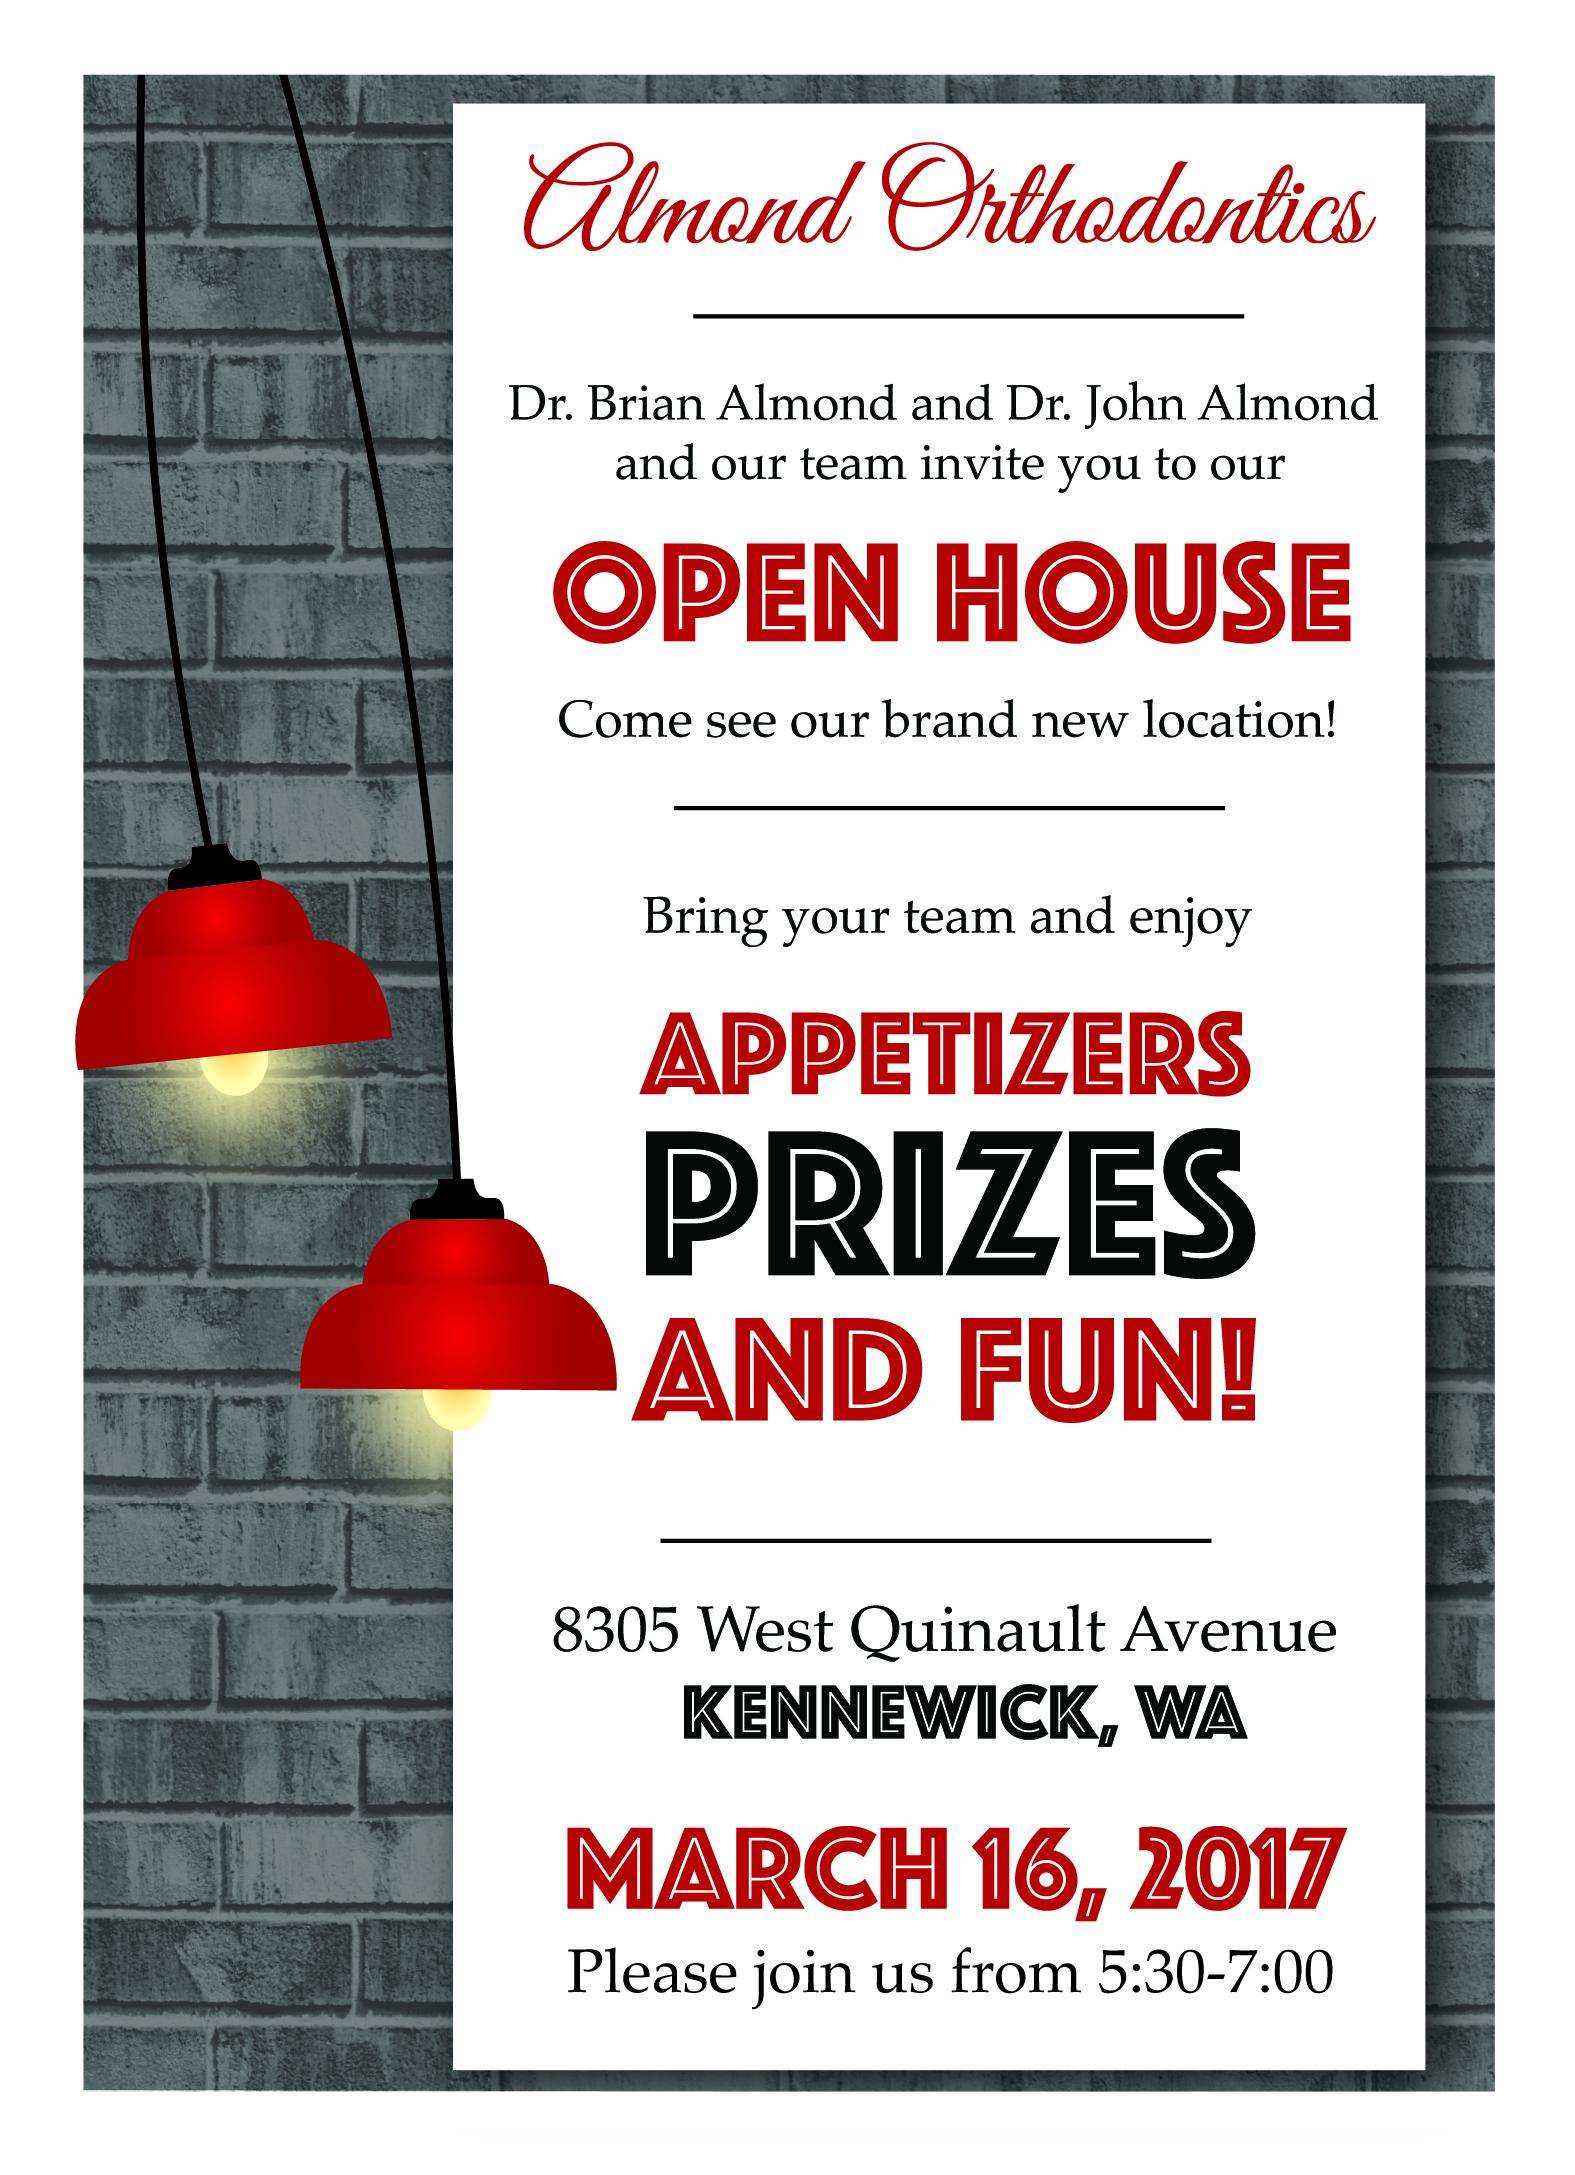 open_house_invitation_invitation.jpg